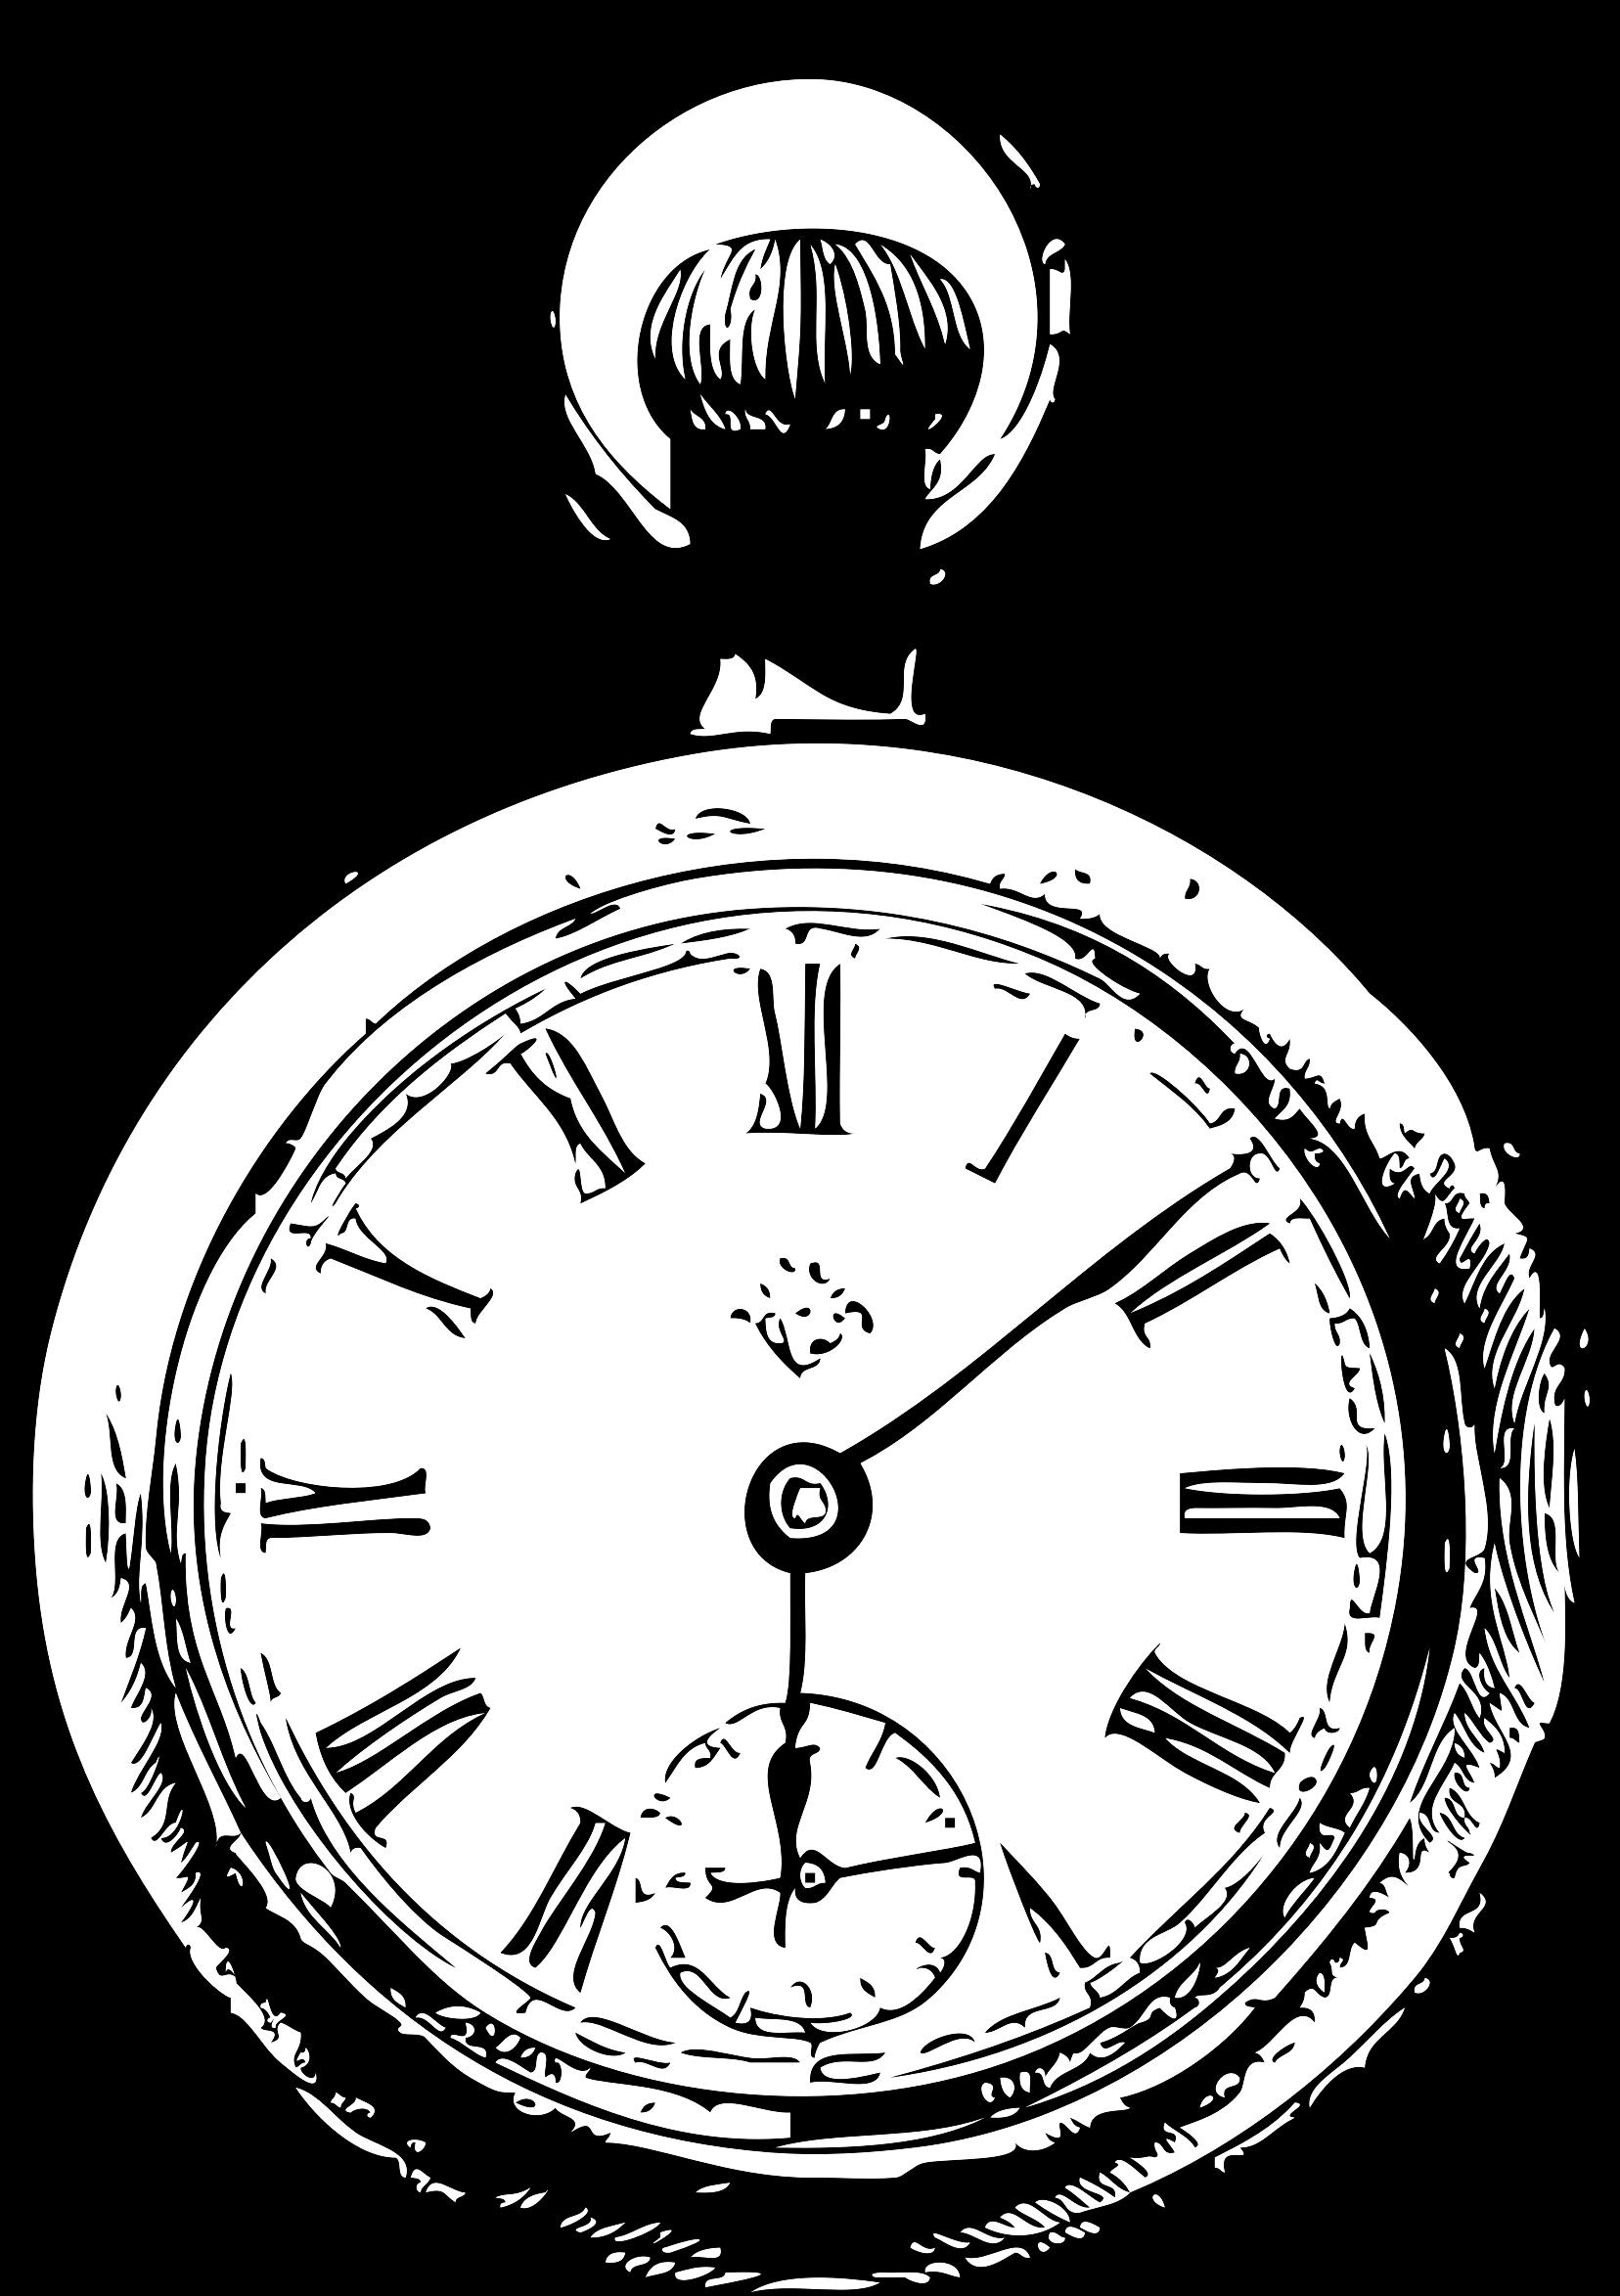 Pocket watch big image. Stopwatch clipart clip art